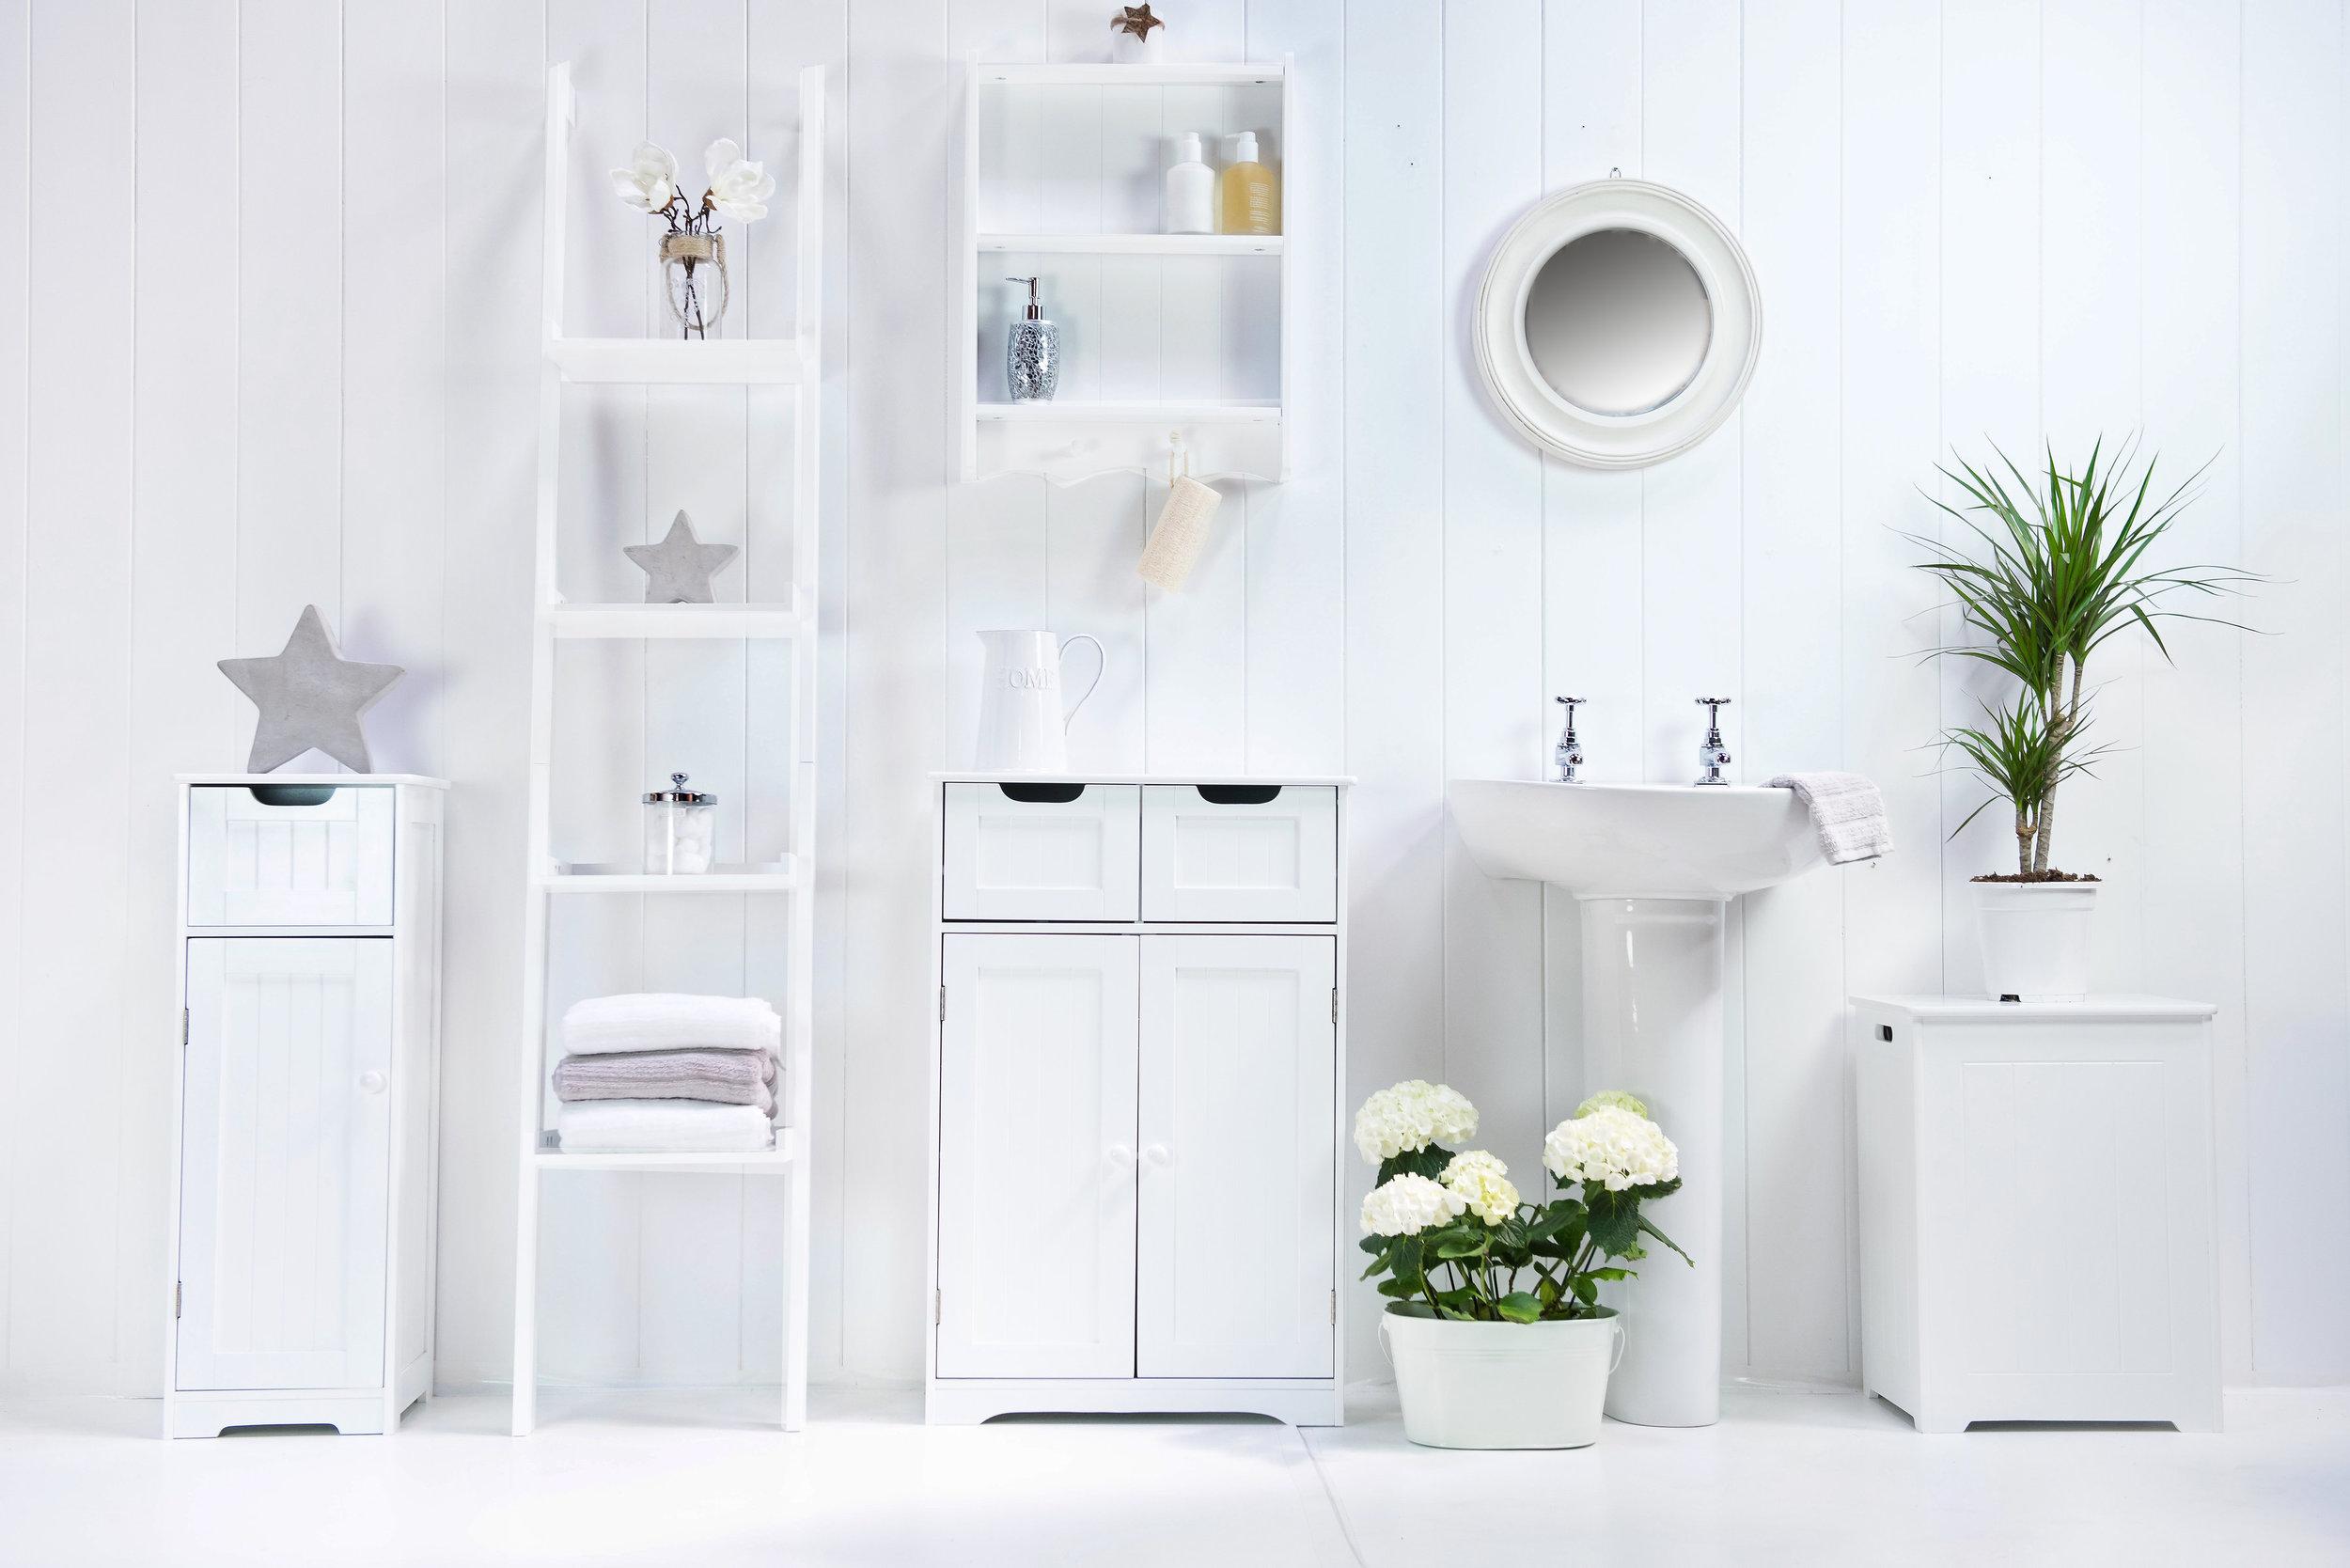 Bathroom 1.2 - Original.jpg